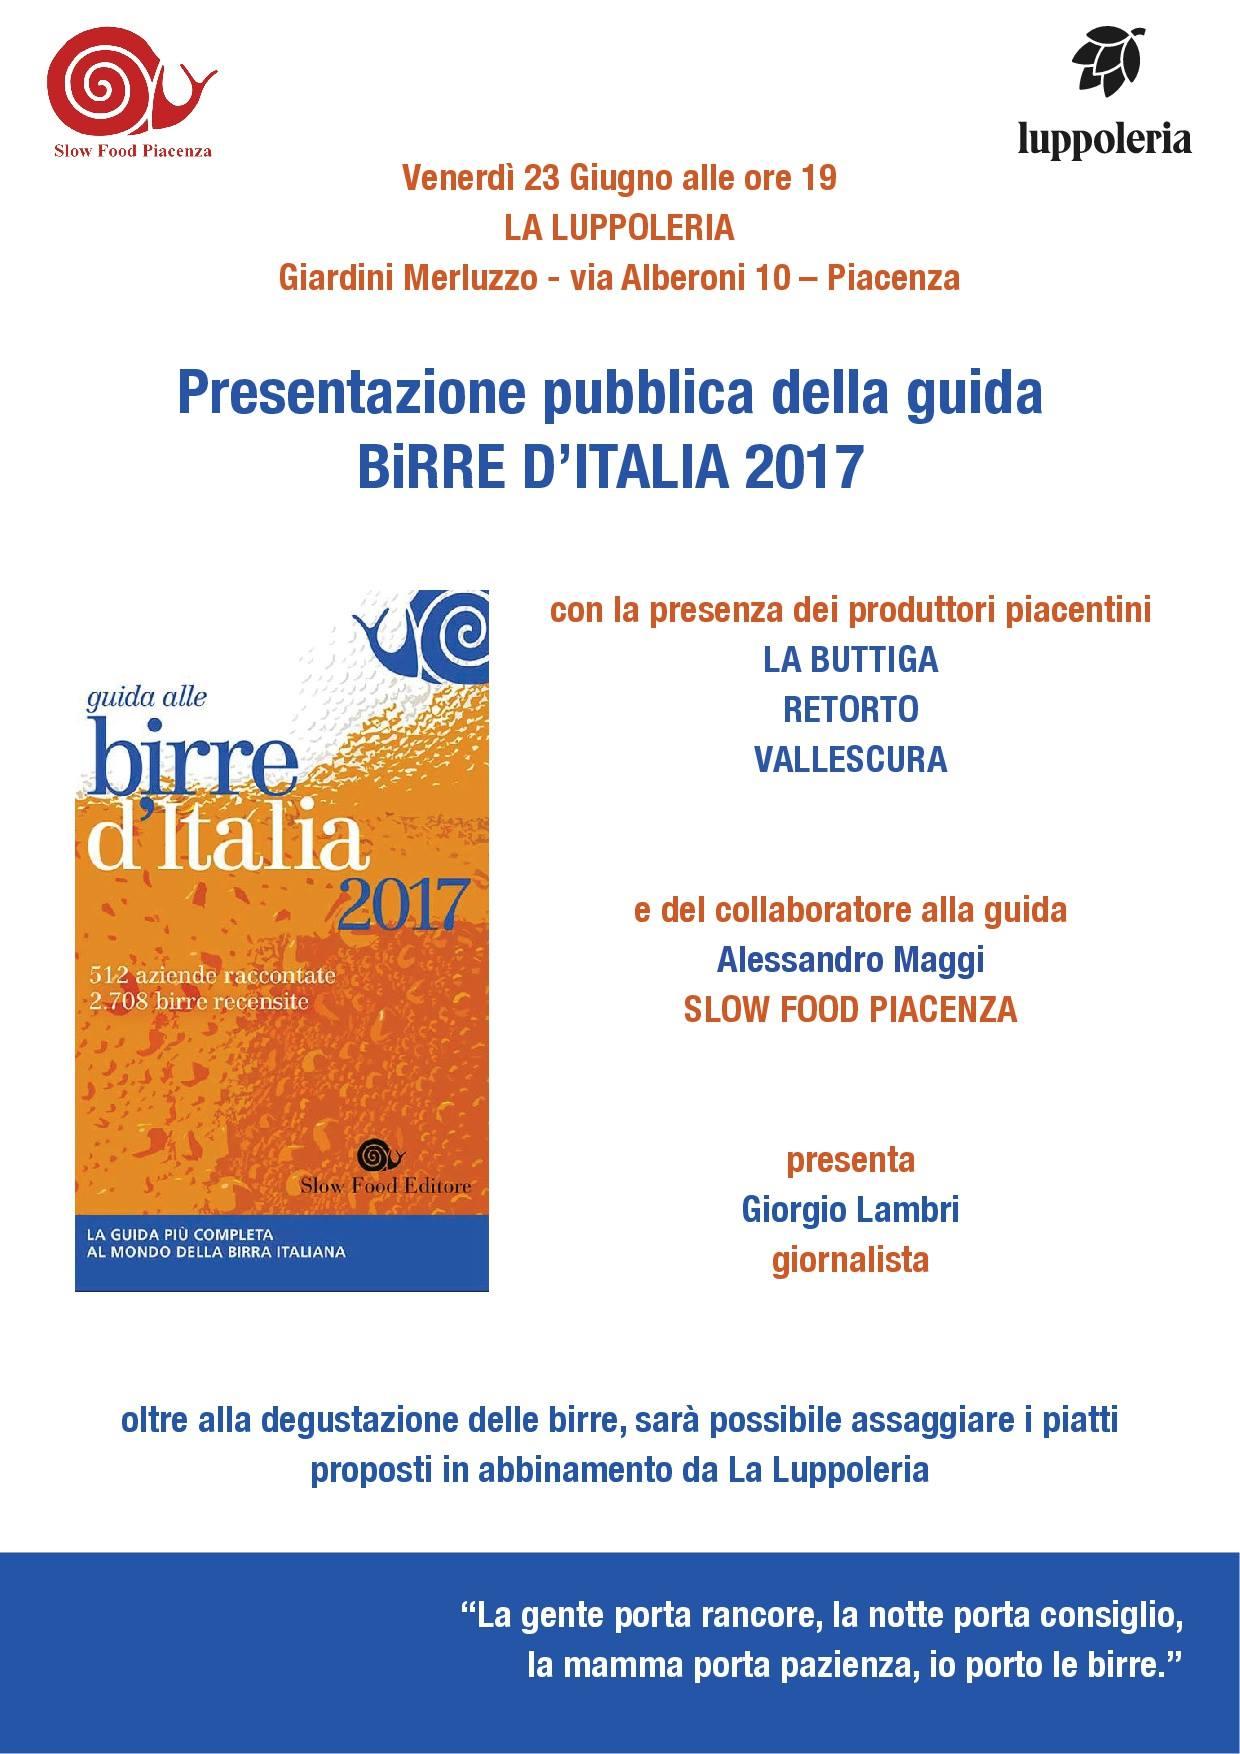 Slow Food Piacenza: la Guida delle birre